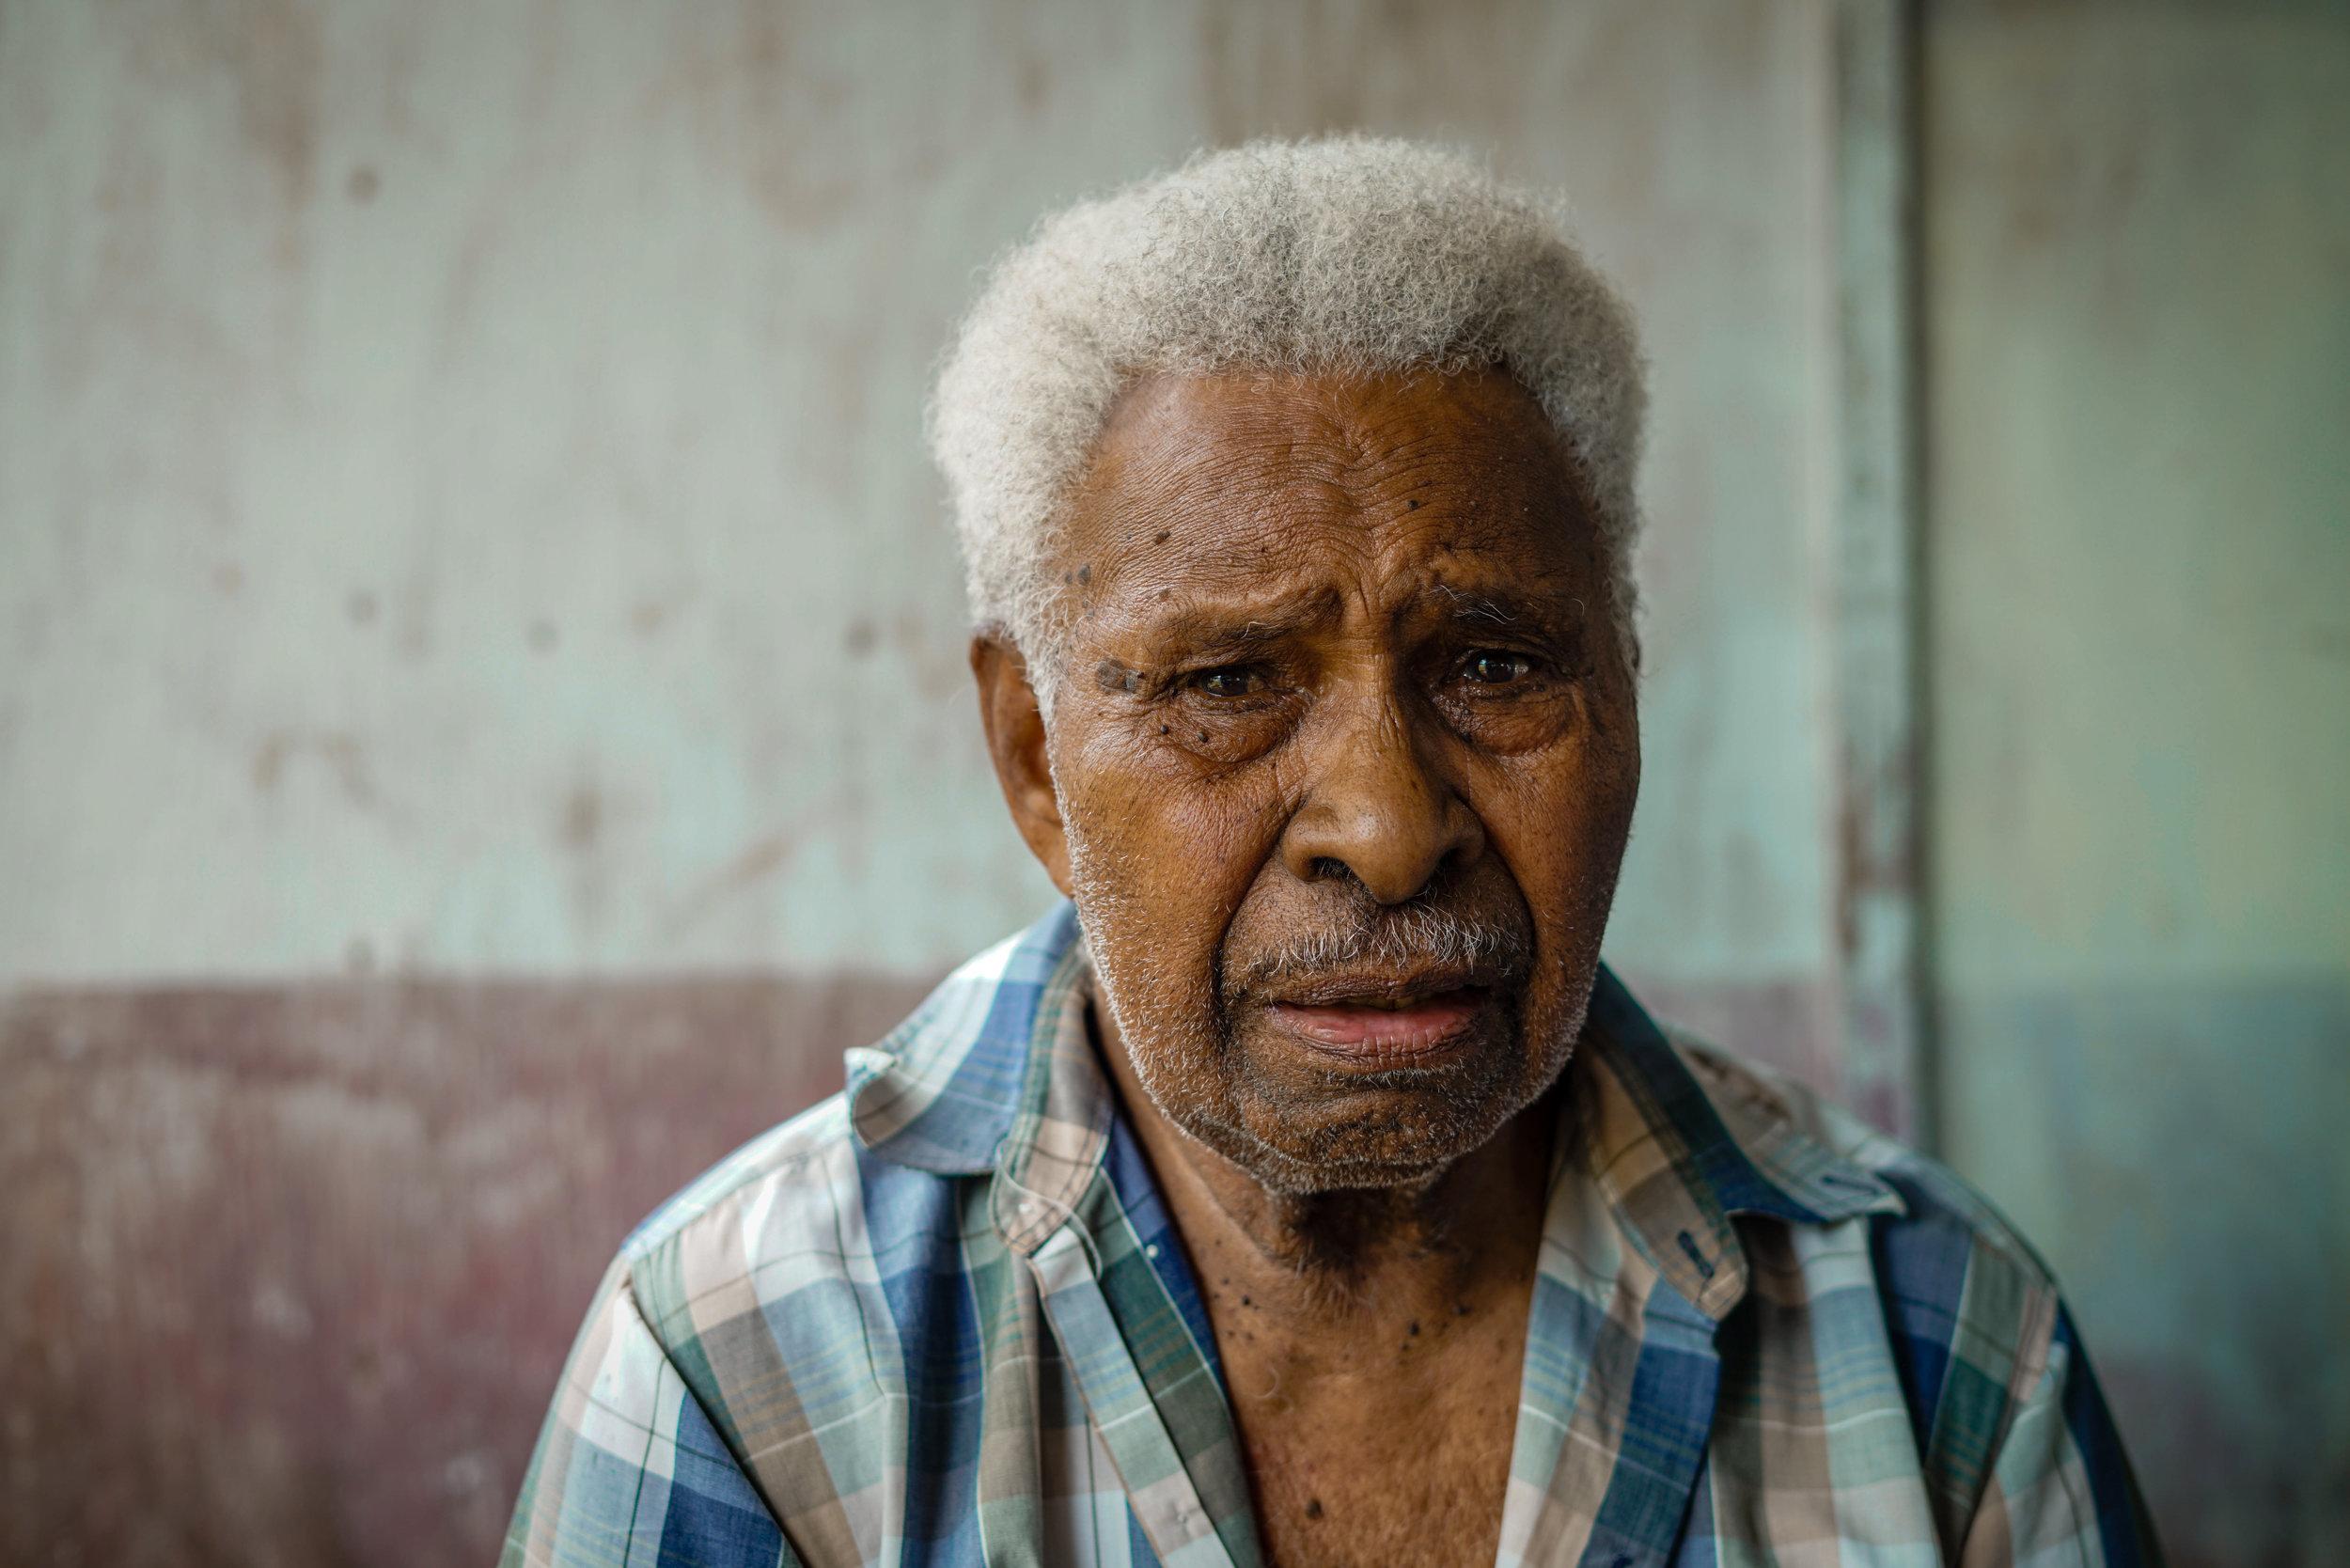 Sharing a story, man from Fijian village | Fiji   ©LaurenKanaChan